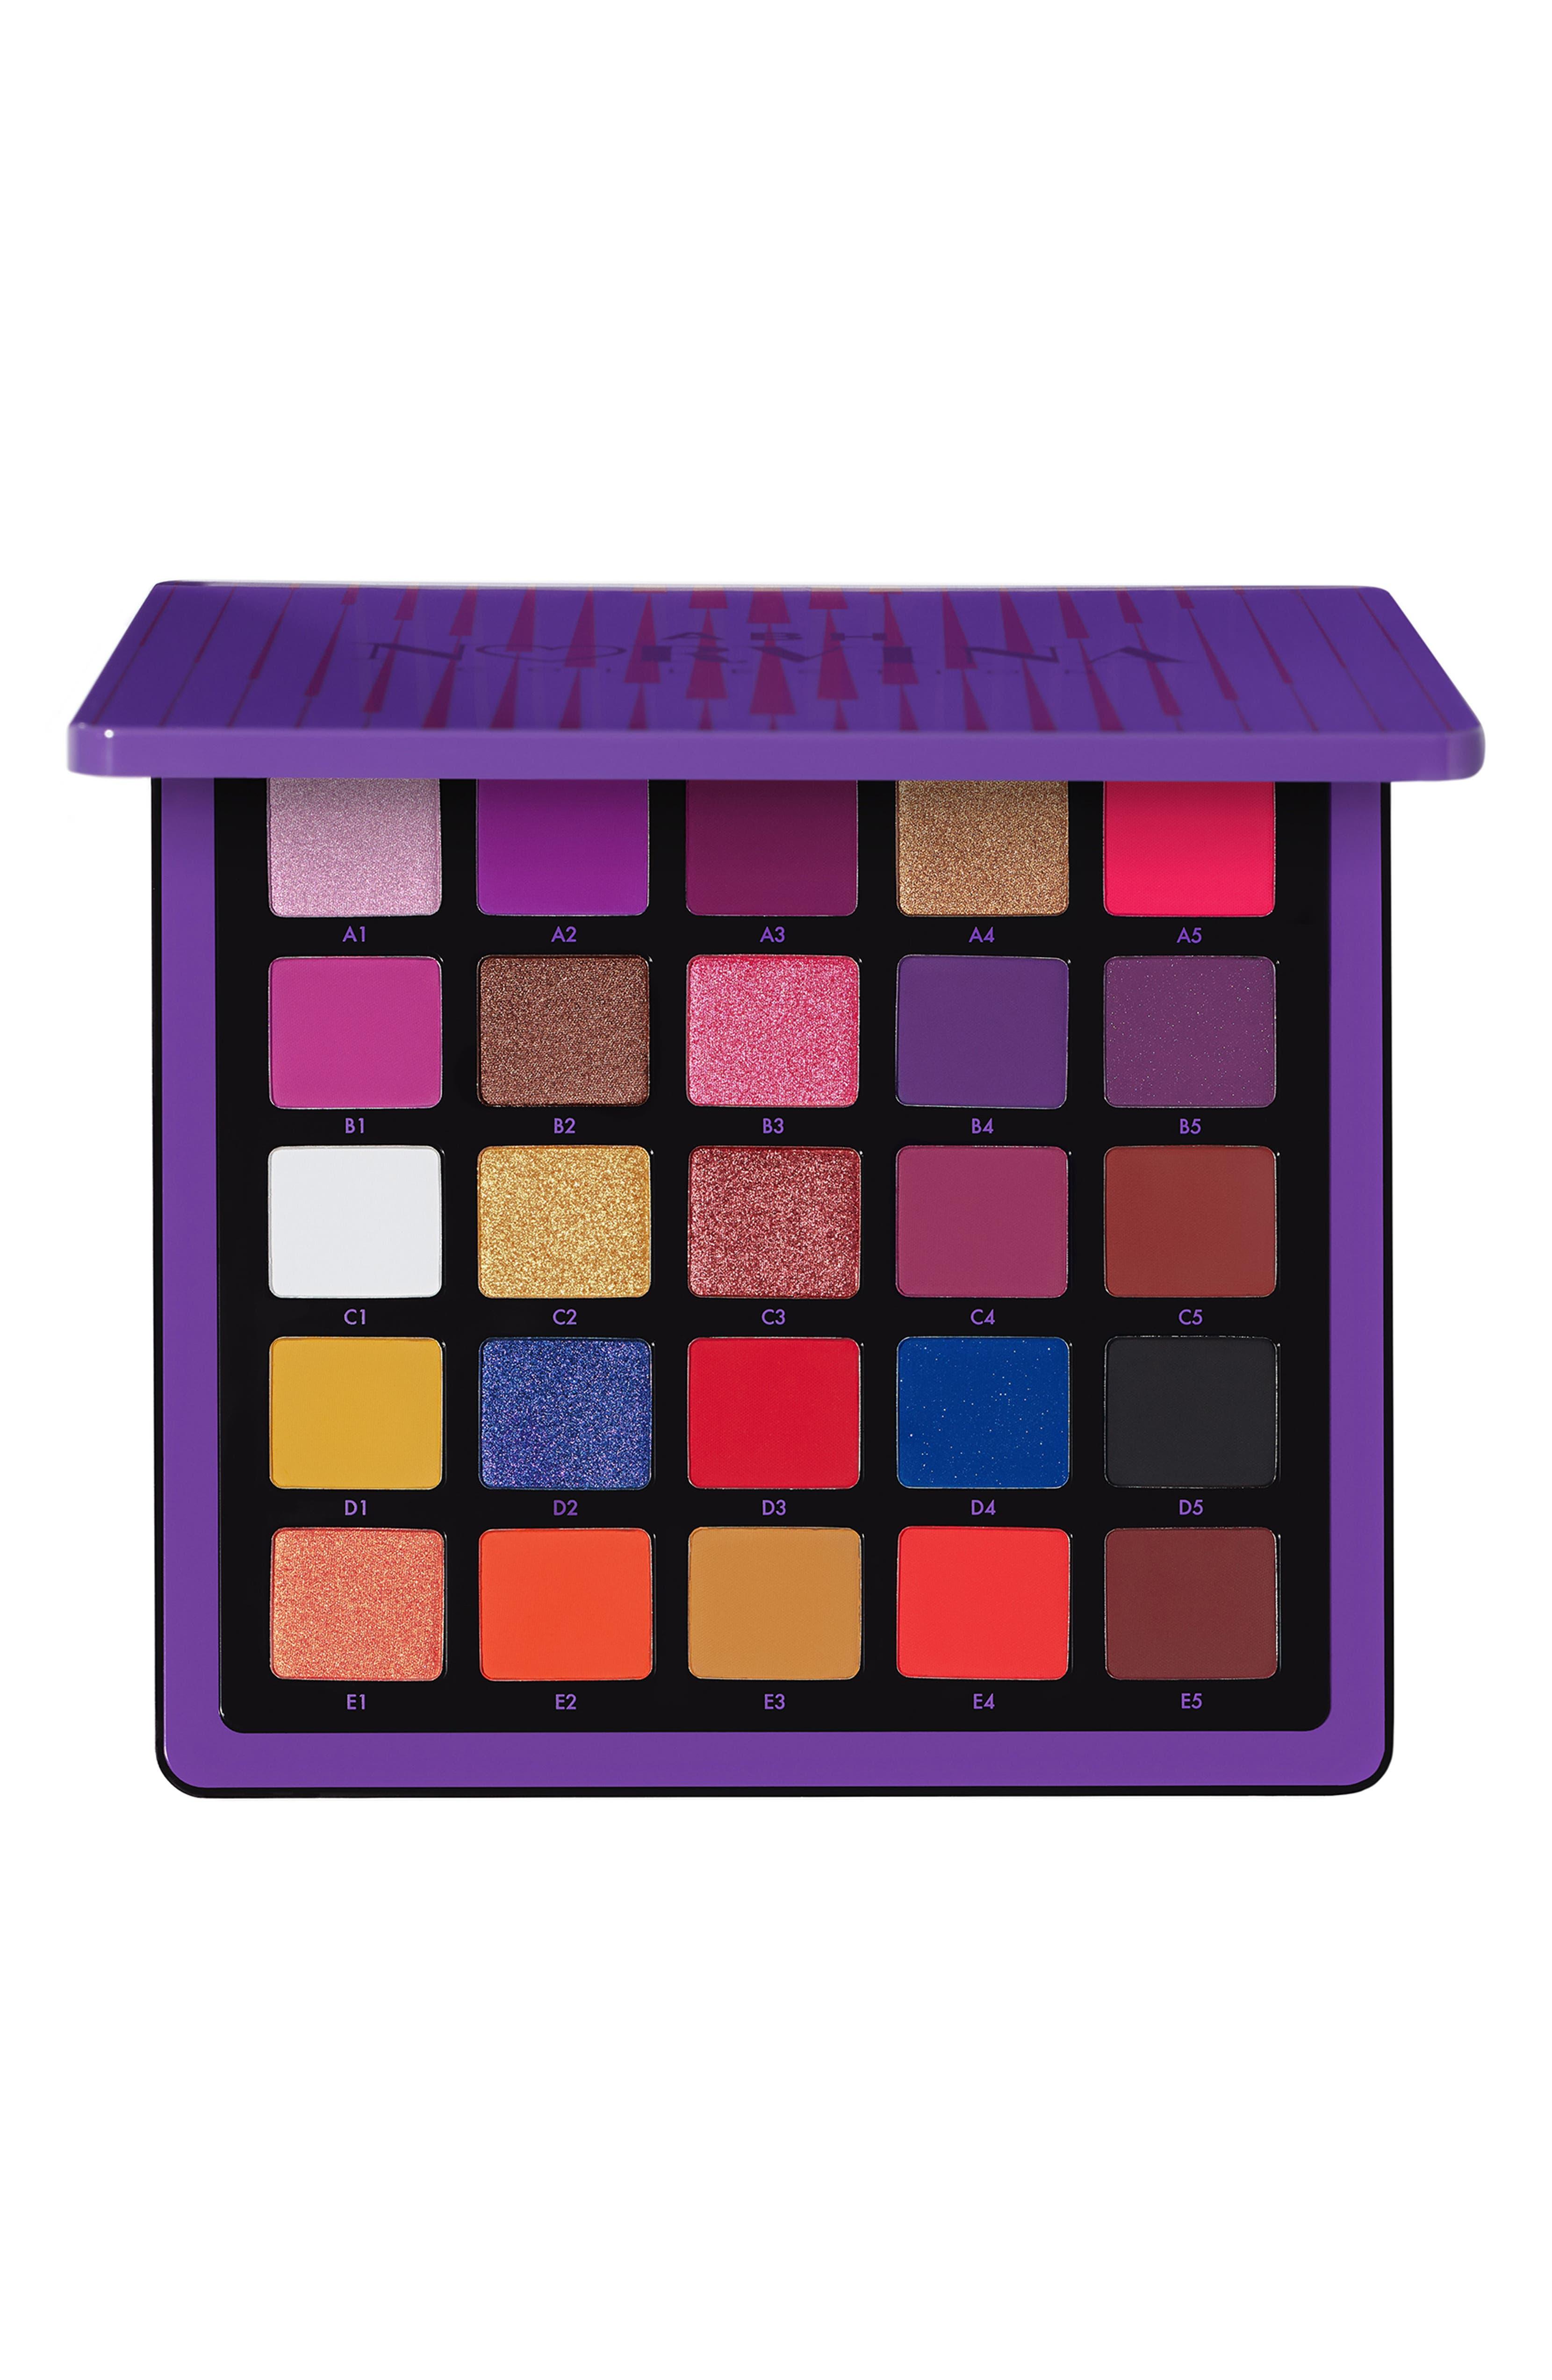 x Norvina Pro Pigment Vol. 1 Eyeshadow Palette ANASTASIA BEVERLY HILLS